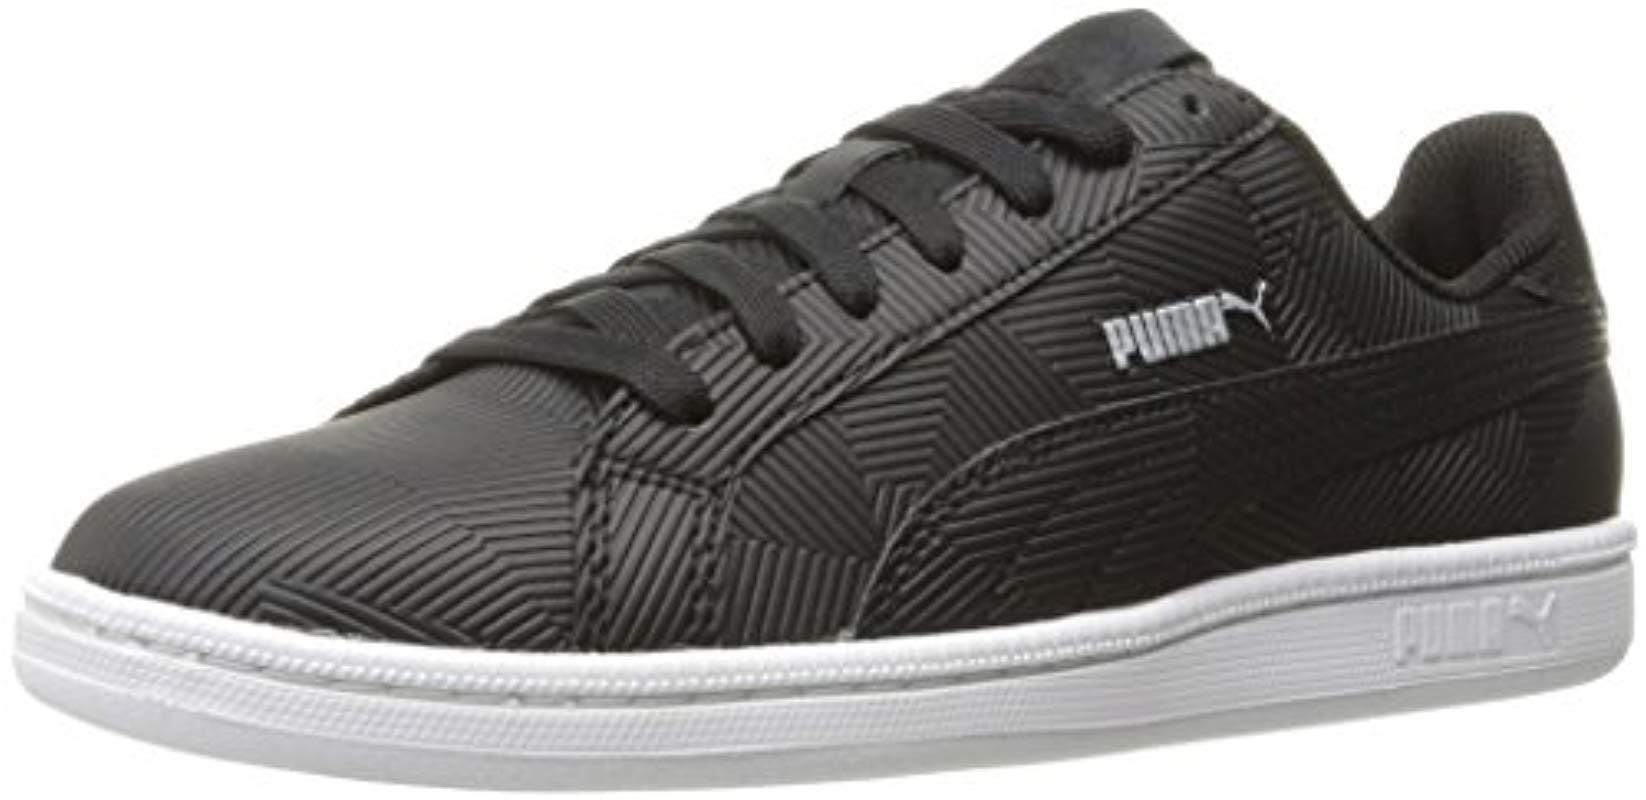 769dd67f010048 Lyst - PUMA Smash Deboss Fashion Sneaker in Black for Men - Save 39%